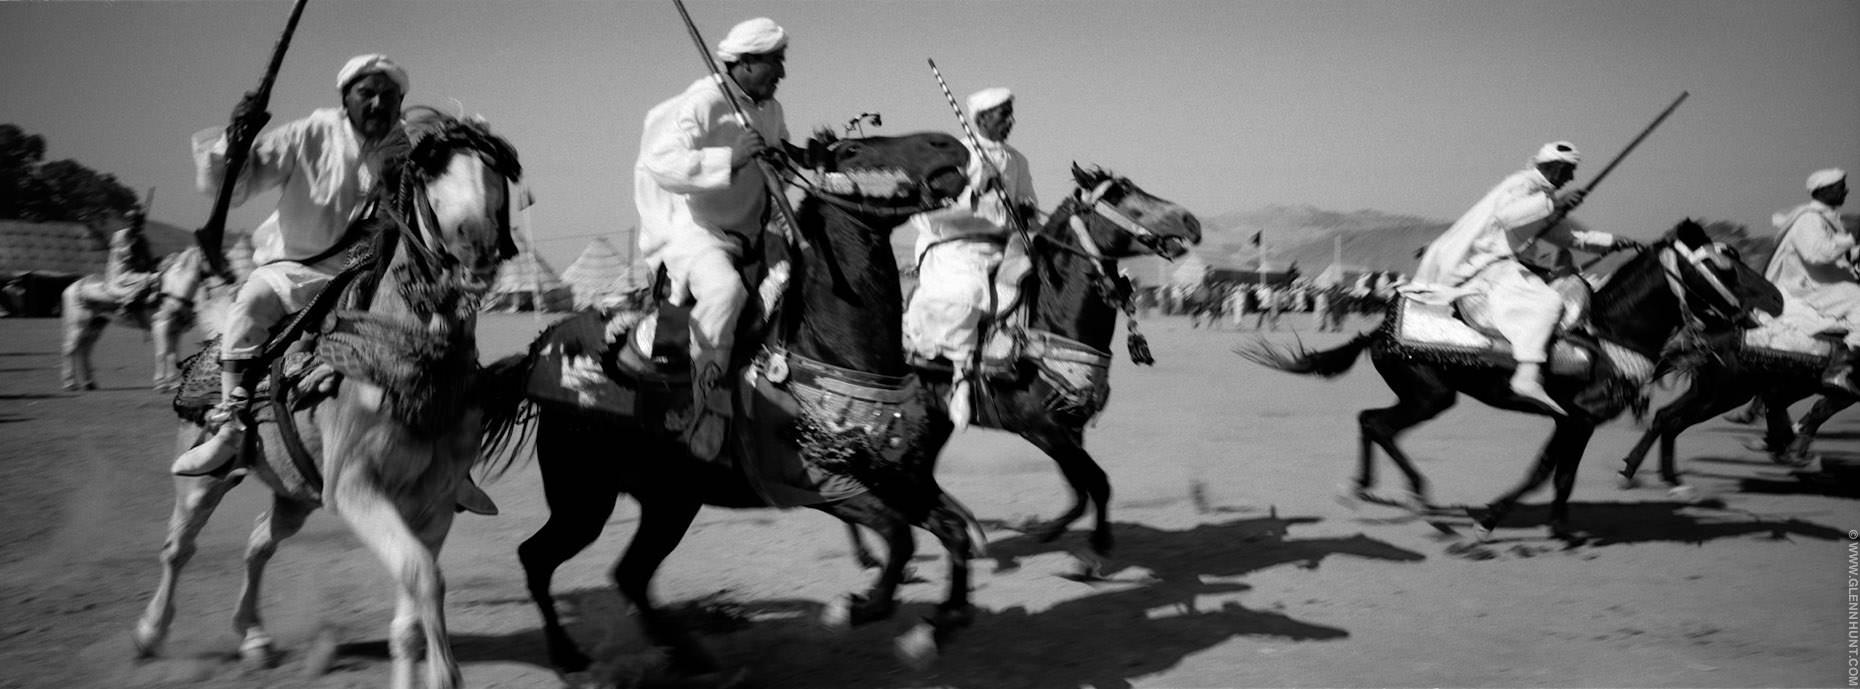 Fantasia Morocco